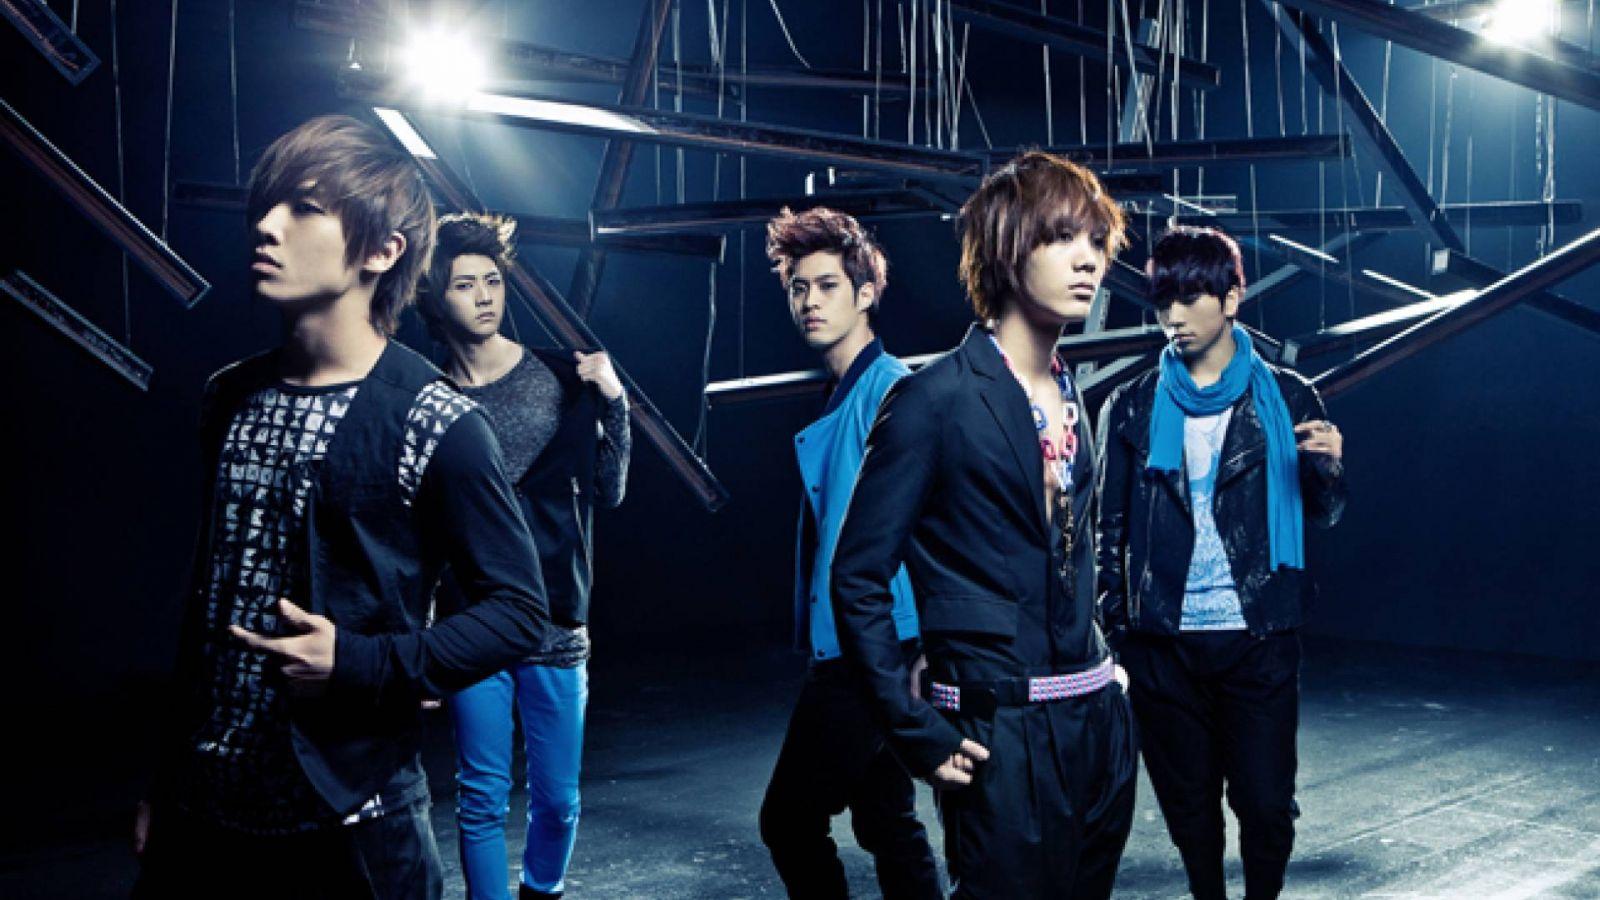 Novo lançamento do MBLAQ © MBLAQ